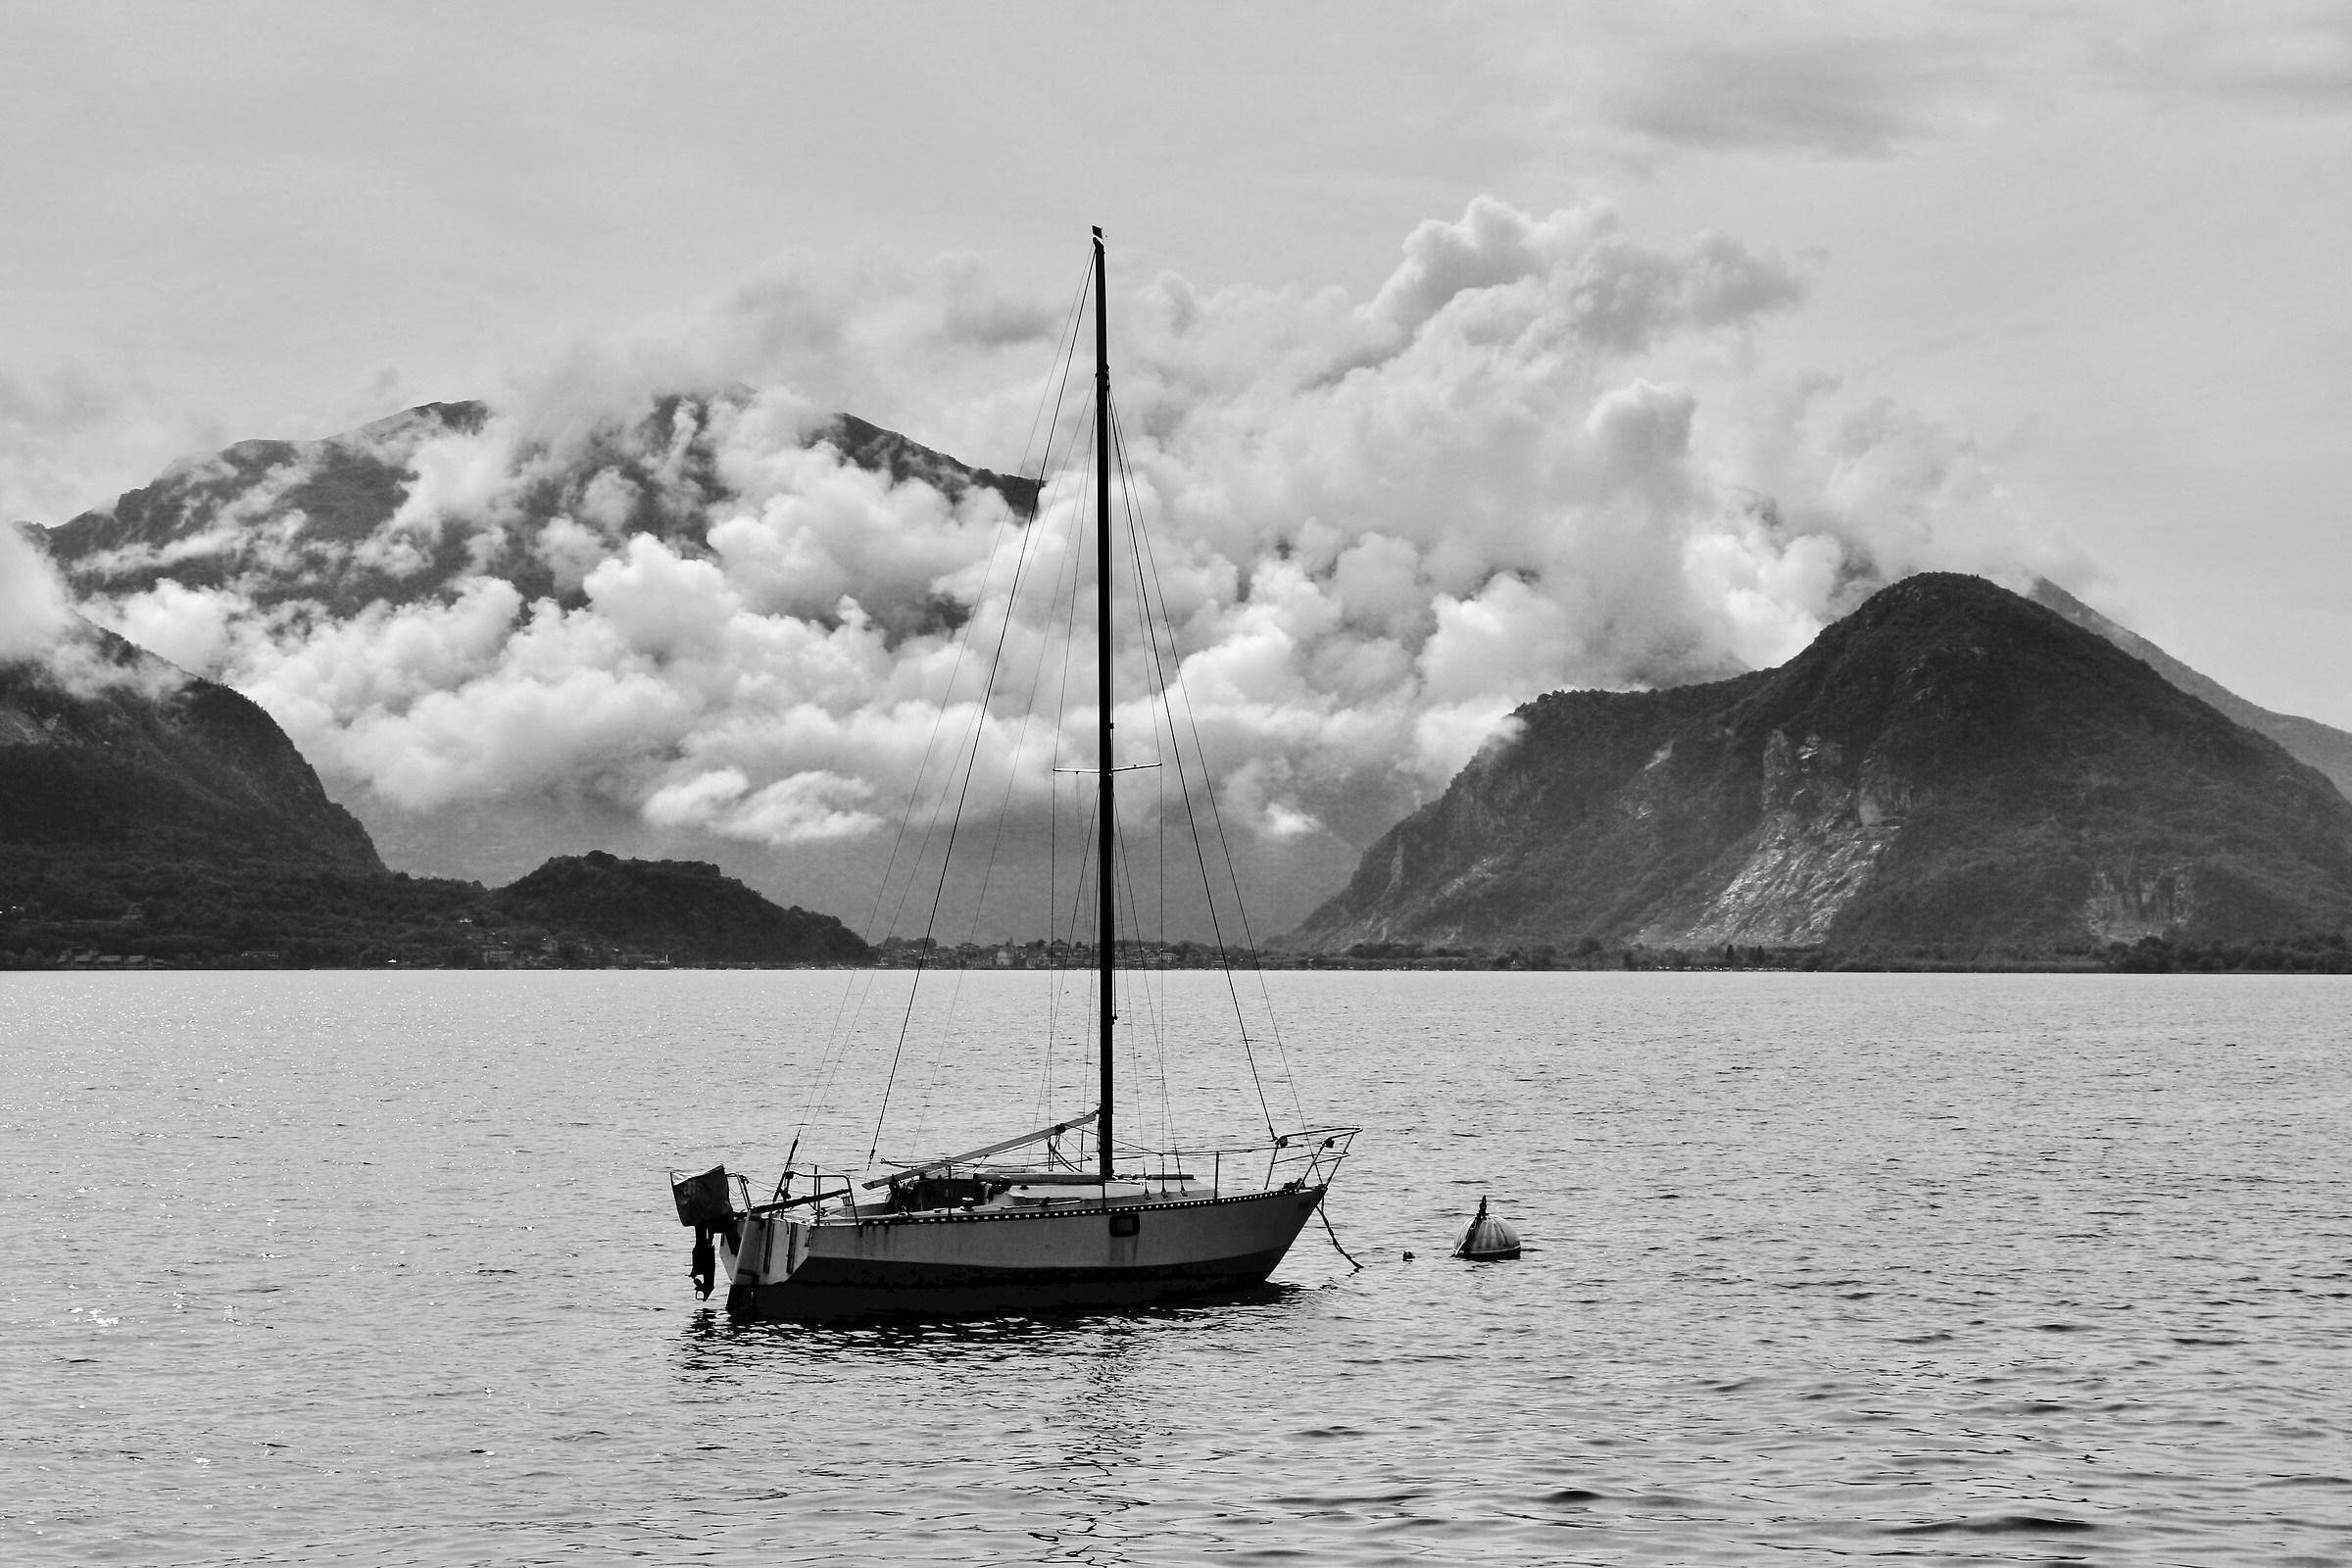 Verbania. Boat on lake (in b / w)...